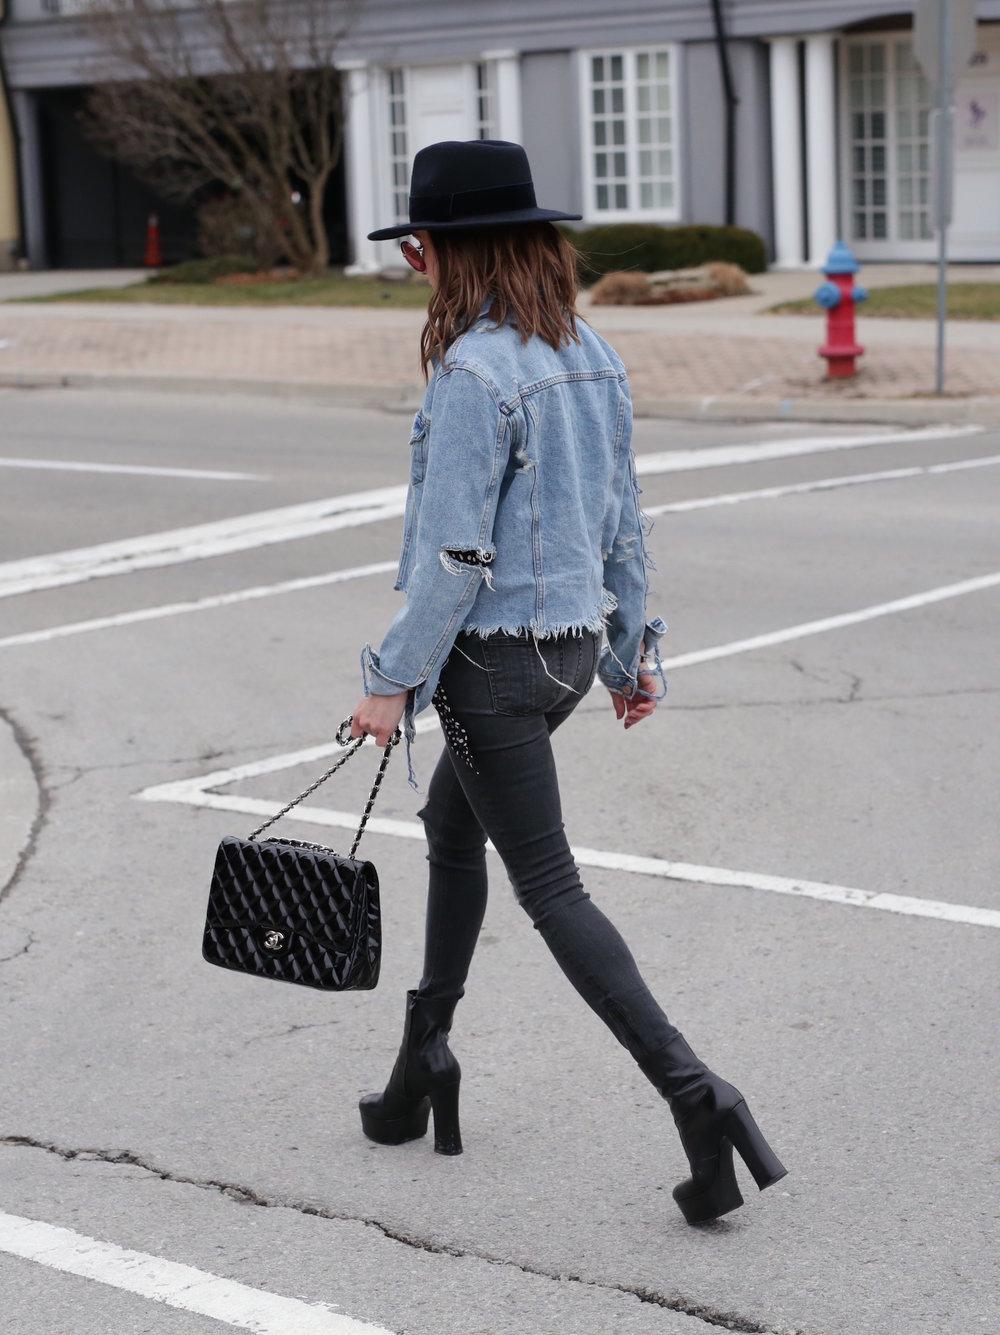 Patent leather Chanel jumbo bag, Saint Laurent platform boots, shredded denim jacket street style - woahstyle.com_7466.JPG